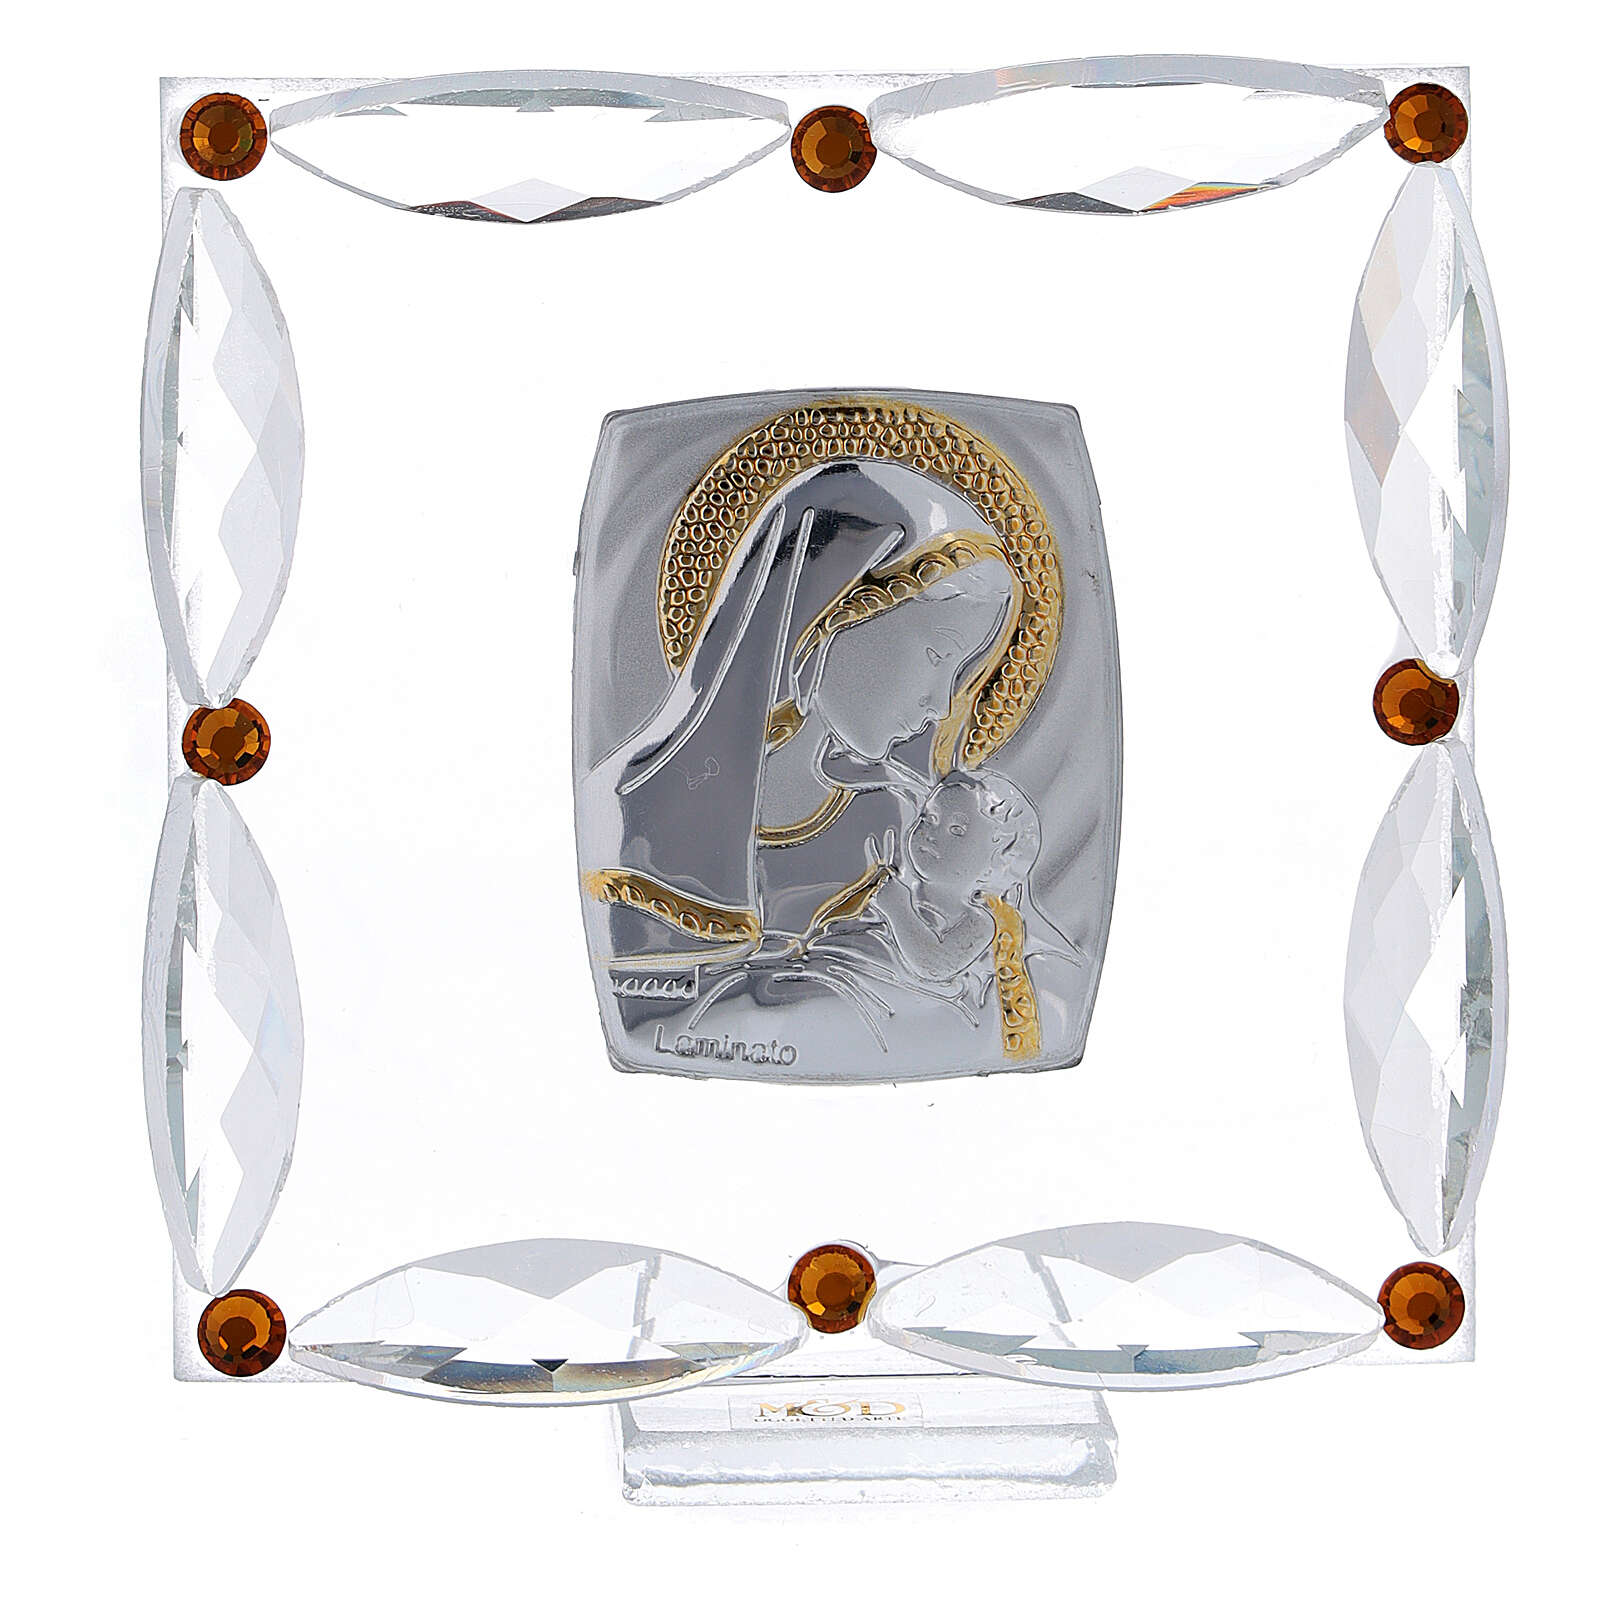 Cuadrito cristales Swarovski bicolor Maternidad bautismo 7x7 cm 3